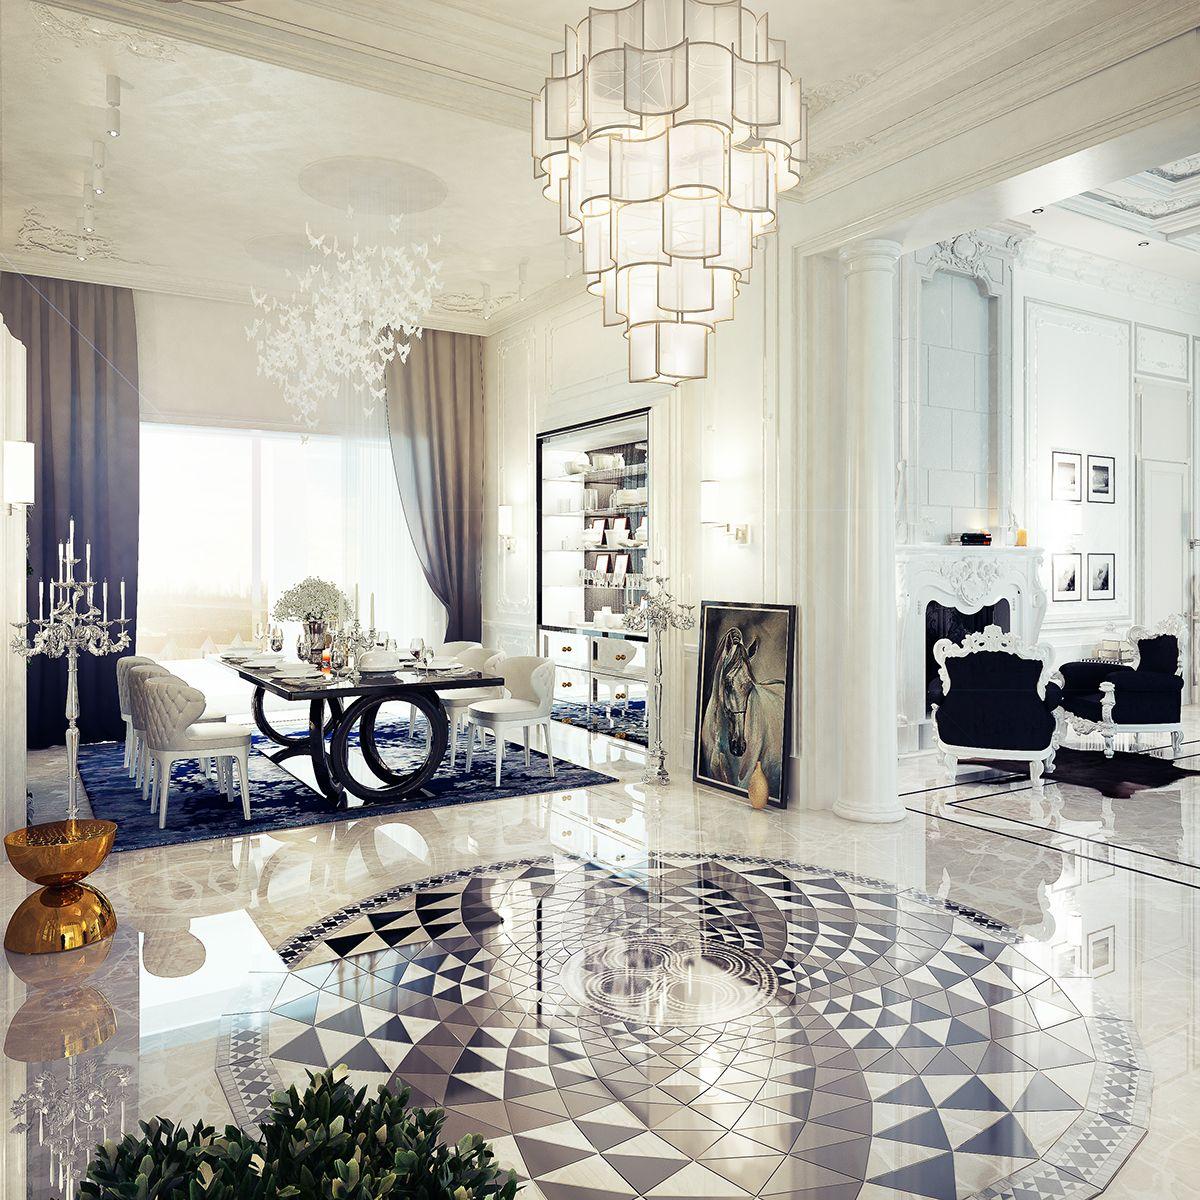 R Class Interior Design On Behance House Interior In 2019